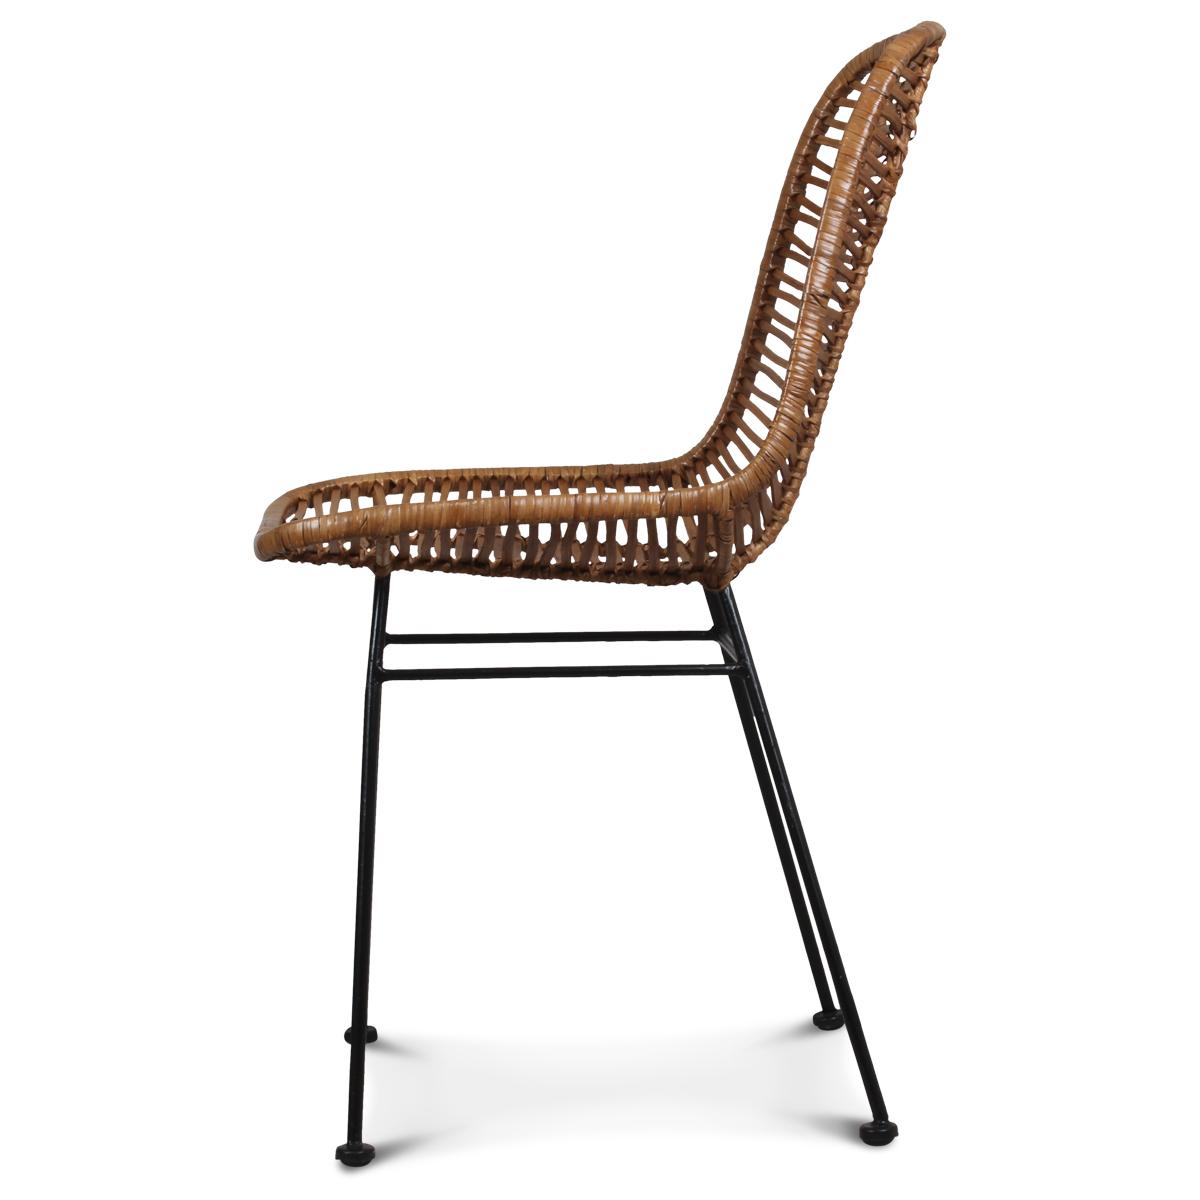 Chaise design metal et rotin malaka demeure et jardin for Chaise bois et rotin